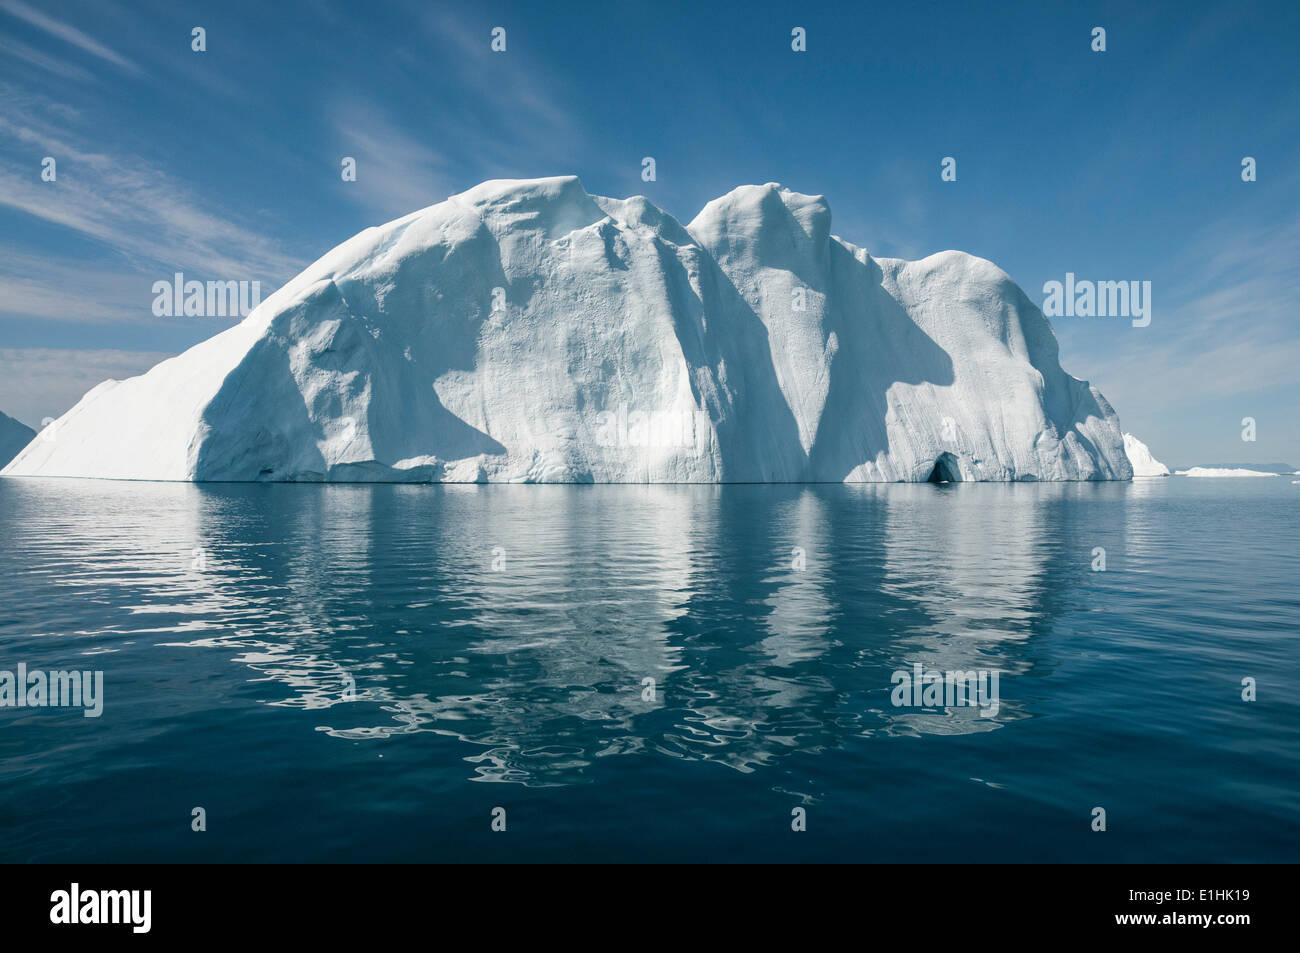 Iceberg, Disko Bay, West Greenland, Greenland - Stock Image